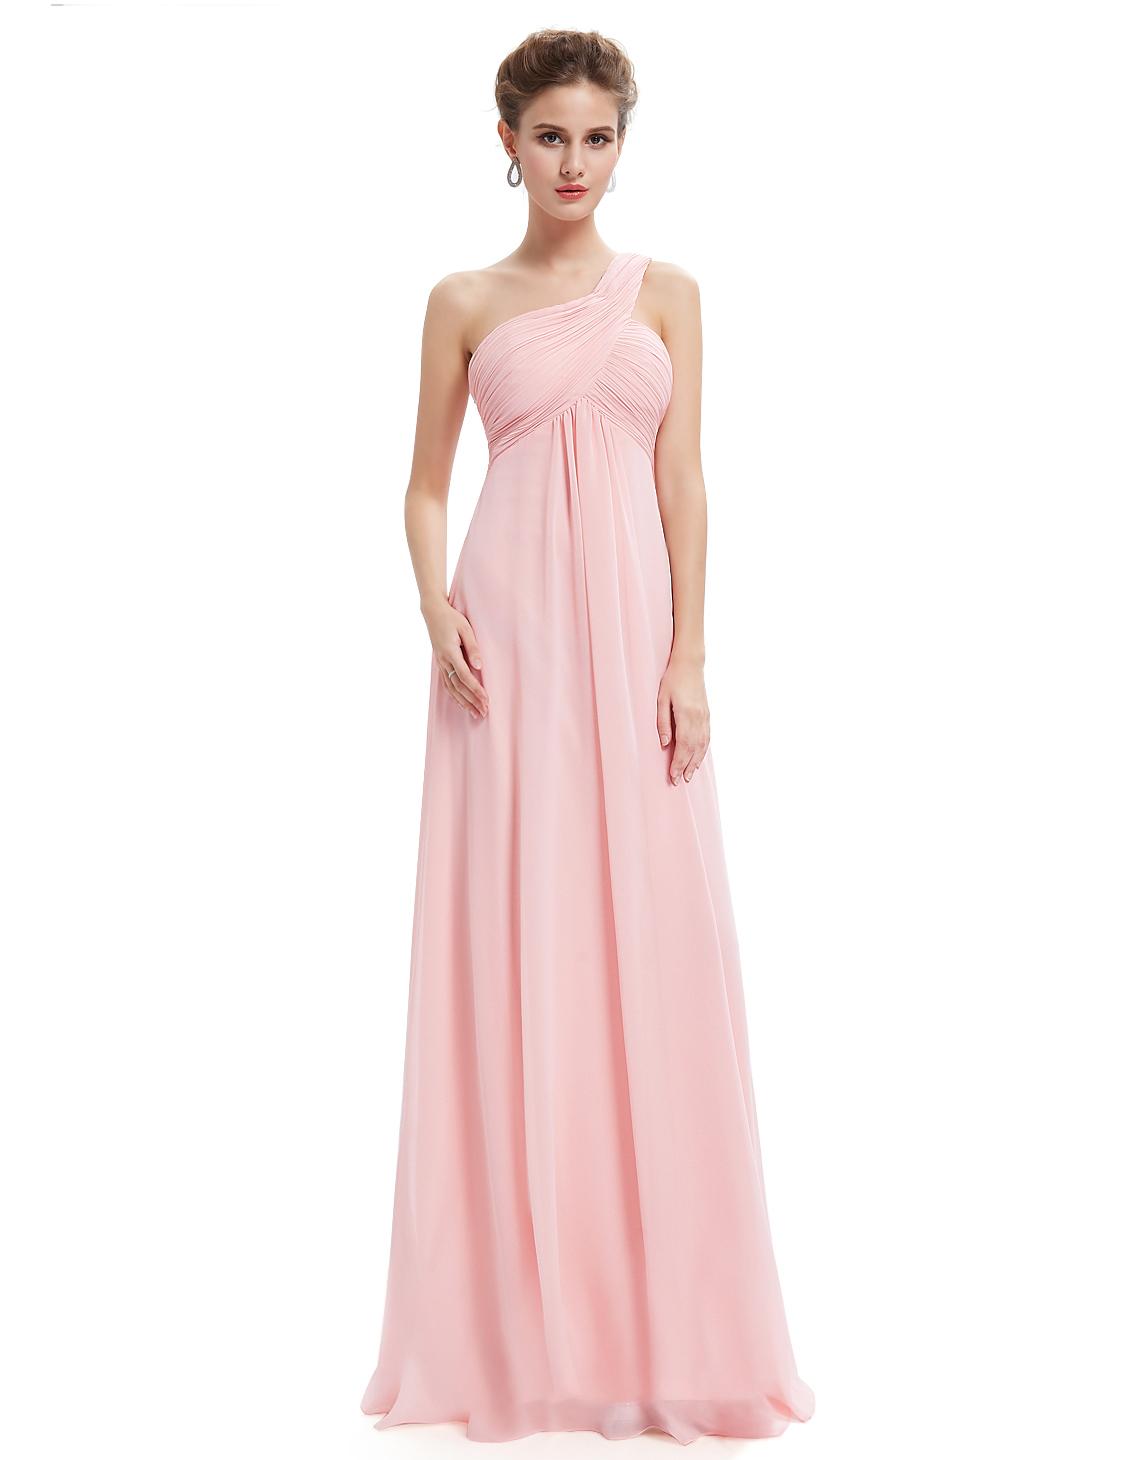 Ever-Pretty-Bridesmaid-Dresses-Chiffon-Ribbon-Long-Formal-Cocktail-Party-Dress thumbnail 20